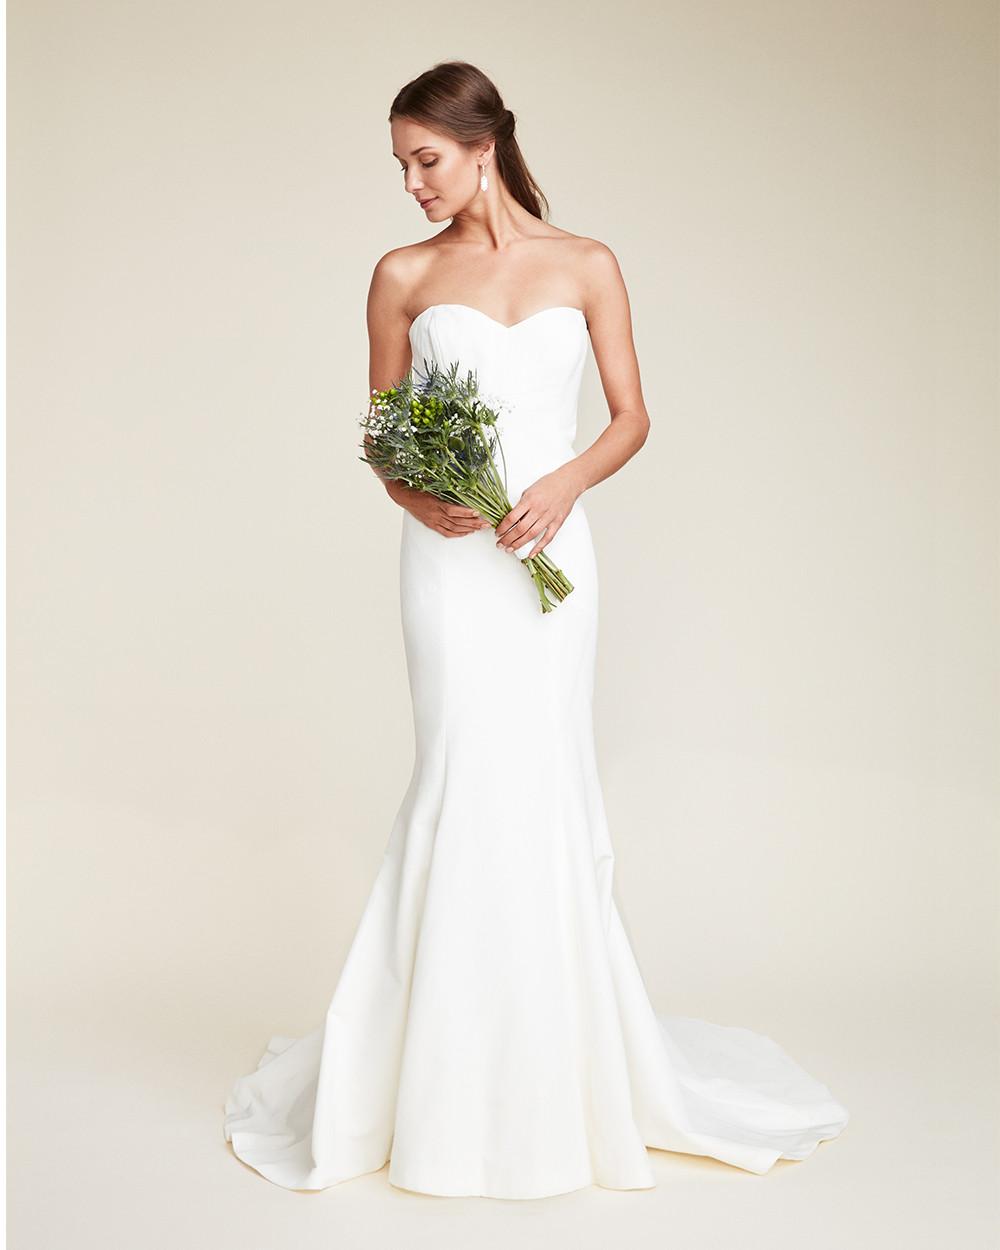 ivory-and-beau-bridal-boutique-zodiac-wedding-style-savannah-wedding-gowns-savannah-wedding-dresses-earnest-loans-1.jpg